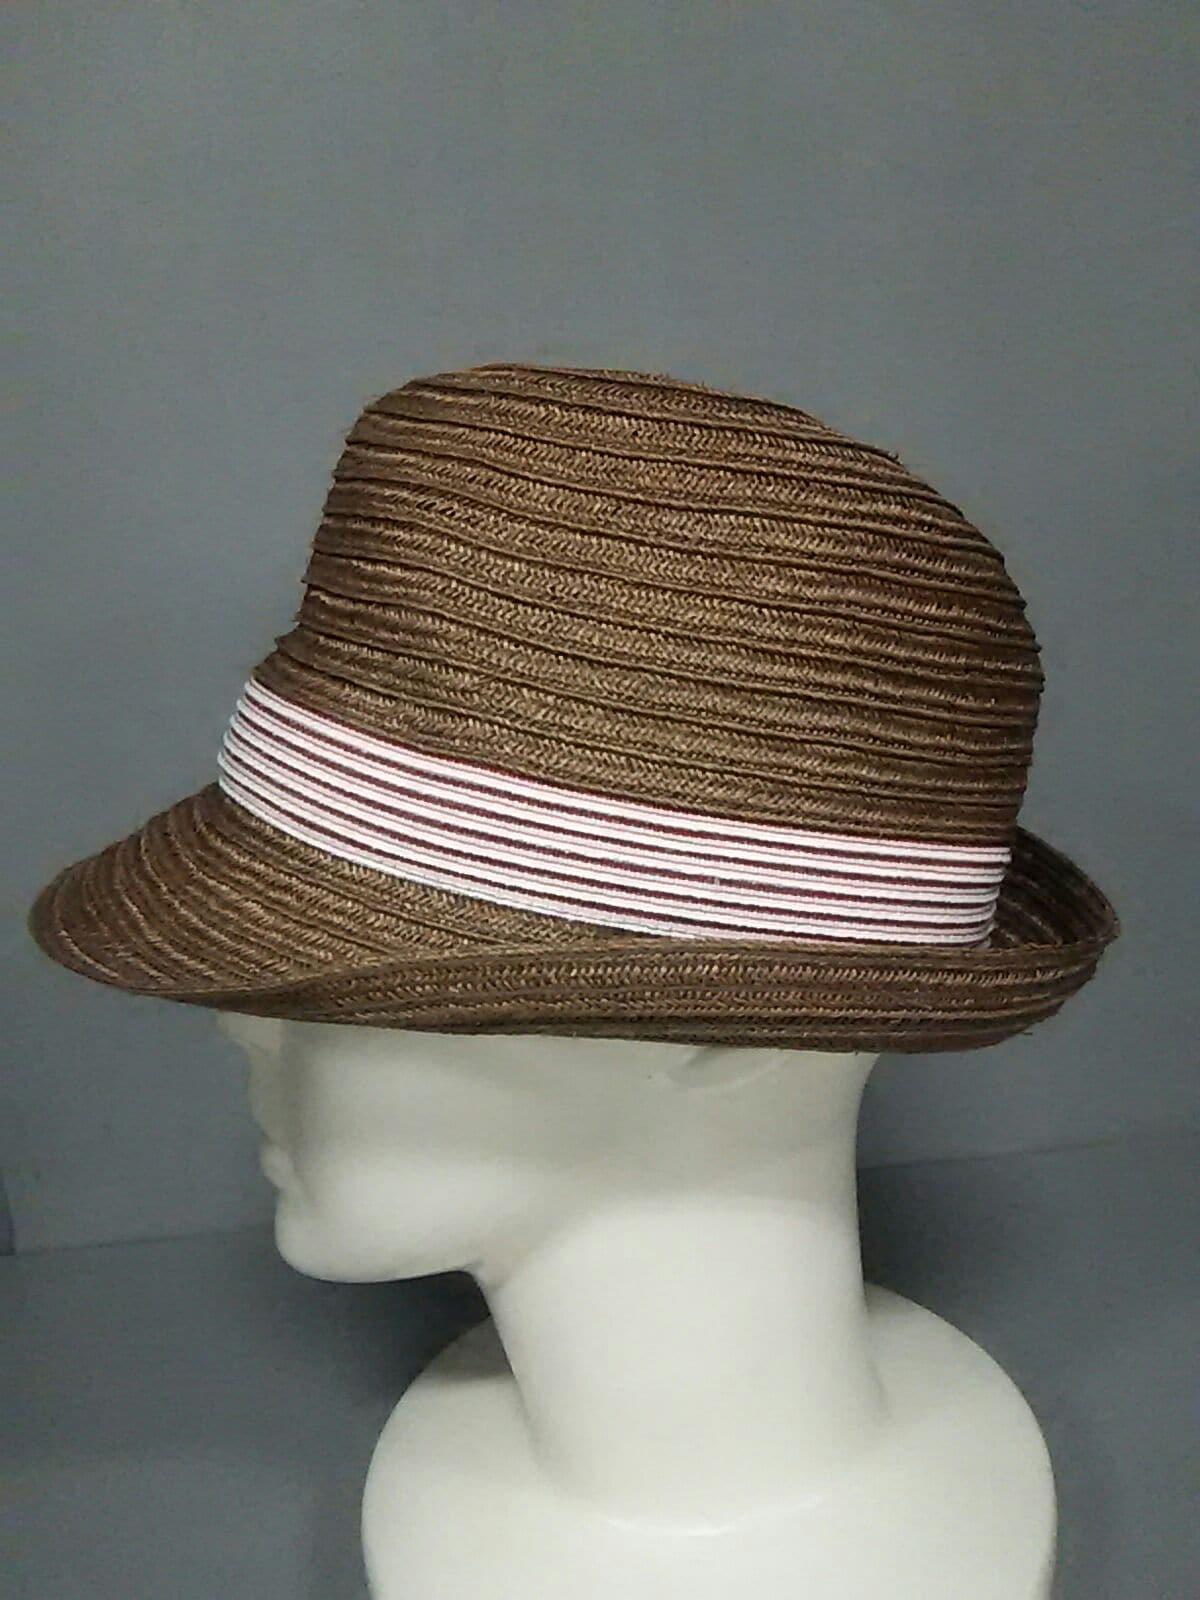 FERRUCCIOVECCHI(フェリシオベッキ)の帽子